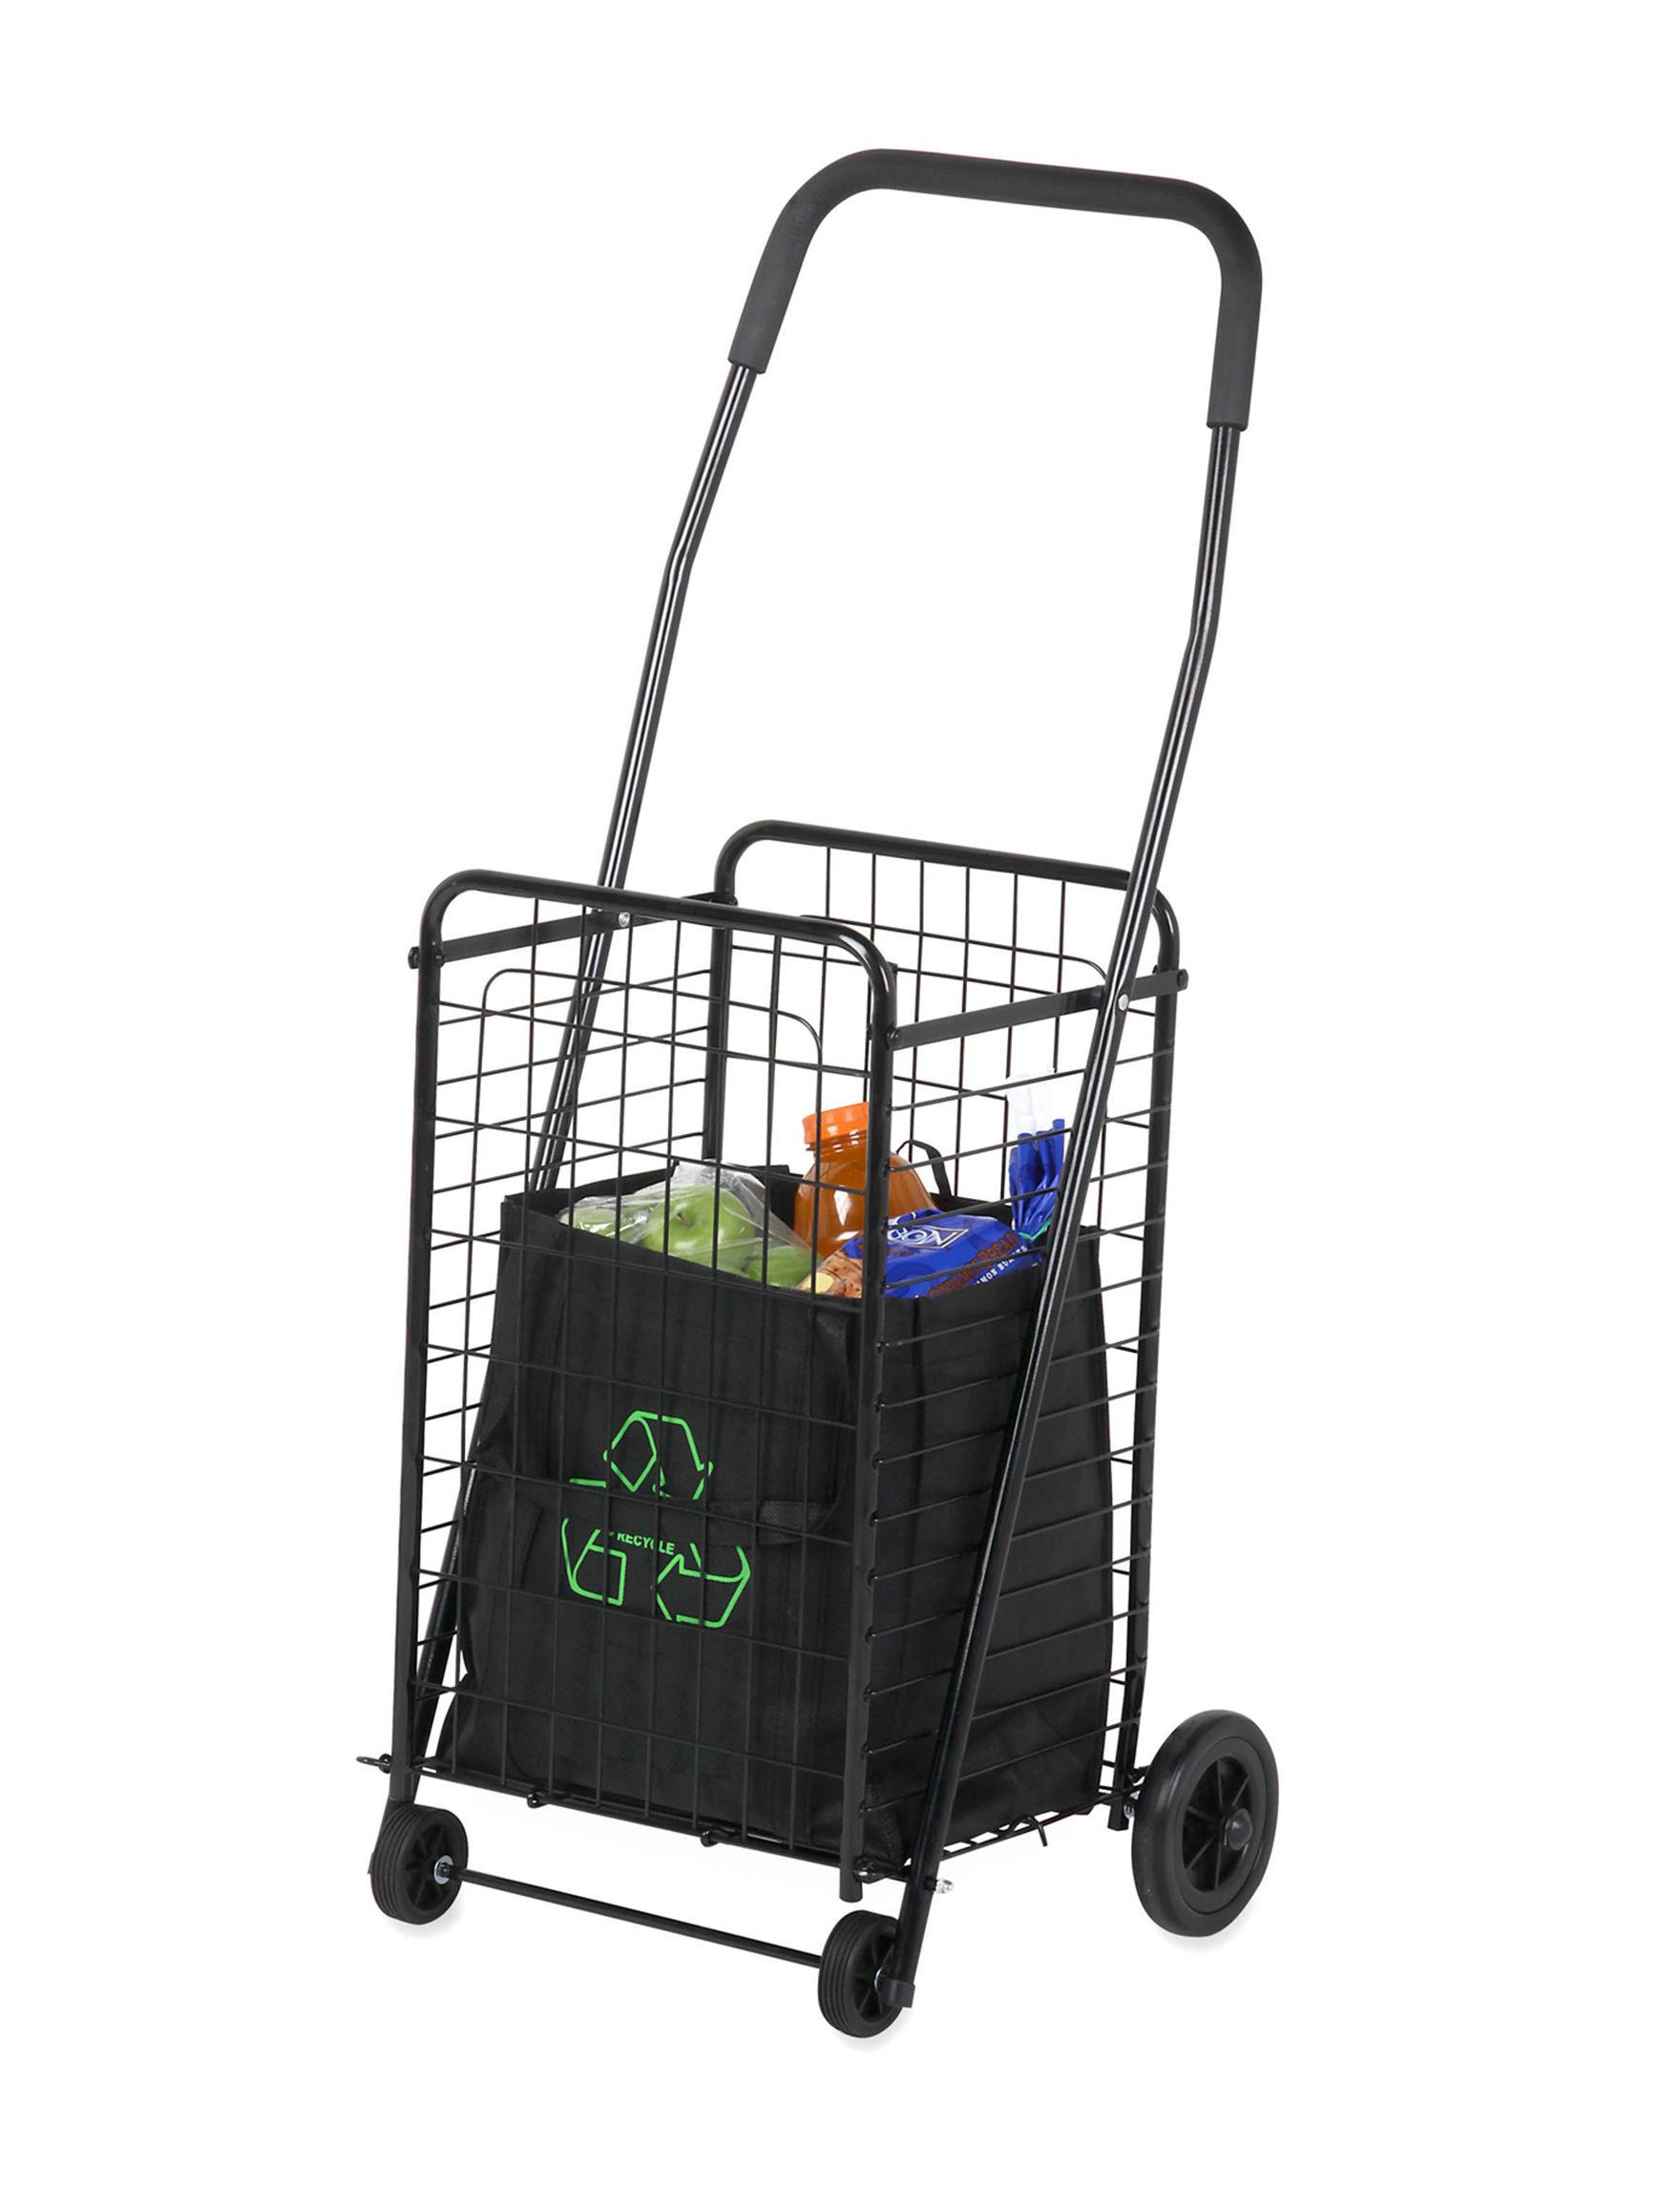 Honey-Can-Do International Black Carts & Drawers Storage & Organization